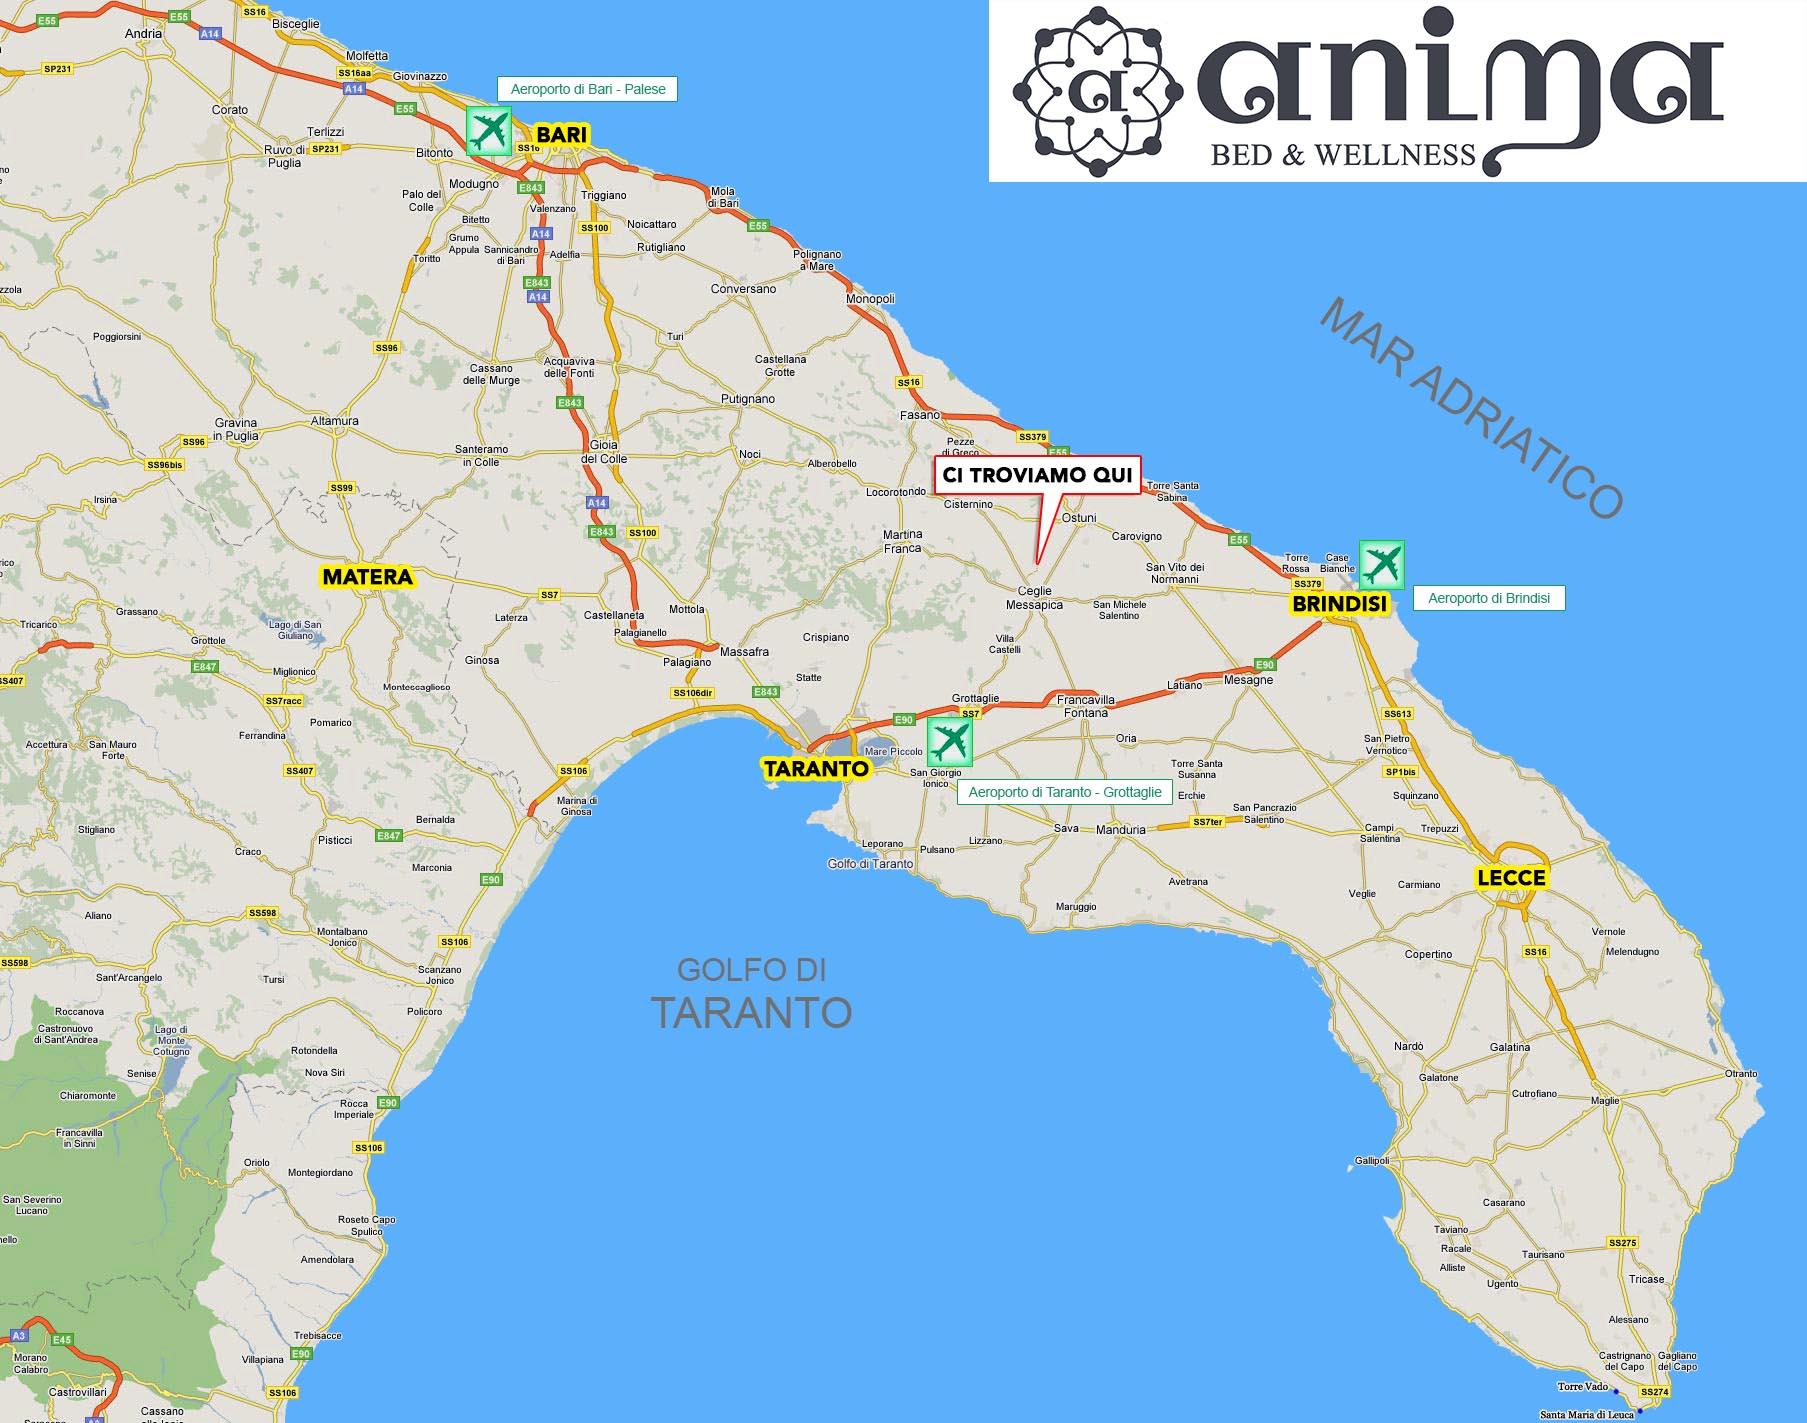 Cartina Aeroporti Puglia.Mappa Puglia Airport Anima Bed Wellness